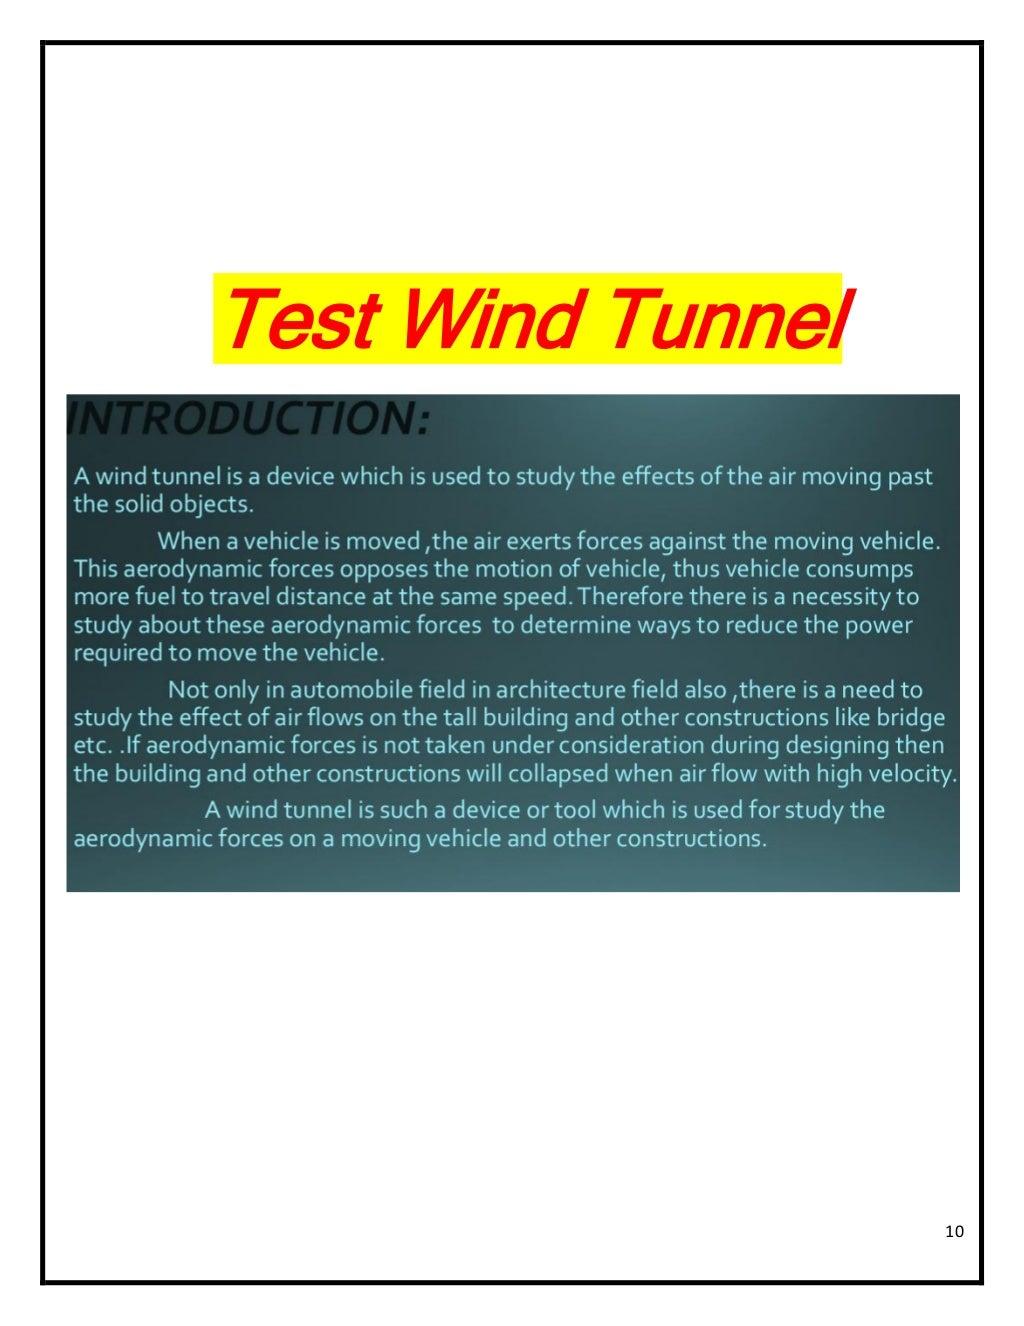 wind-tunnel-building-test-10-1024.jpg